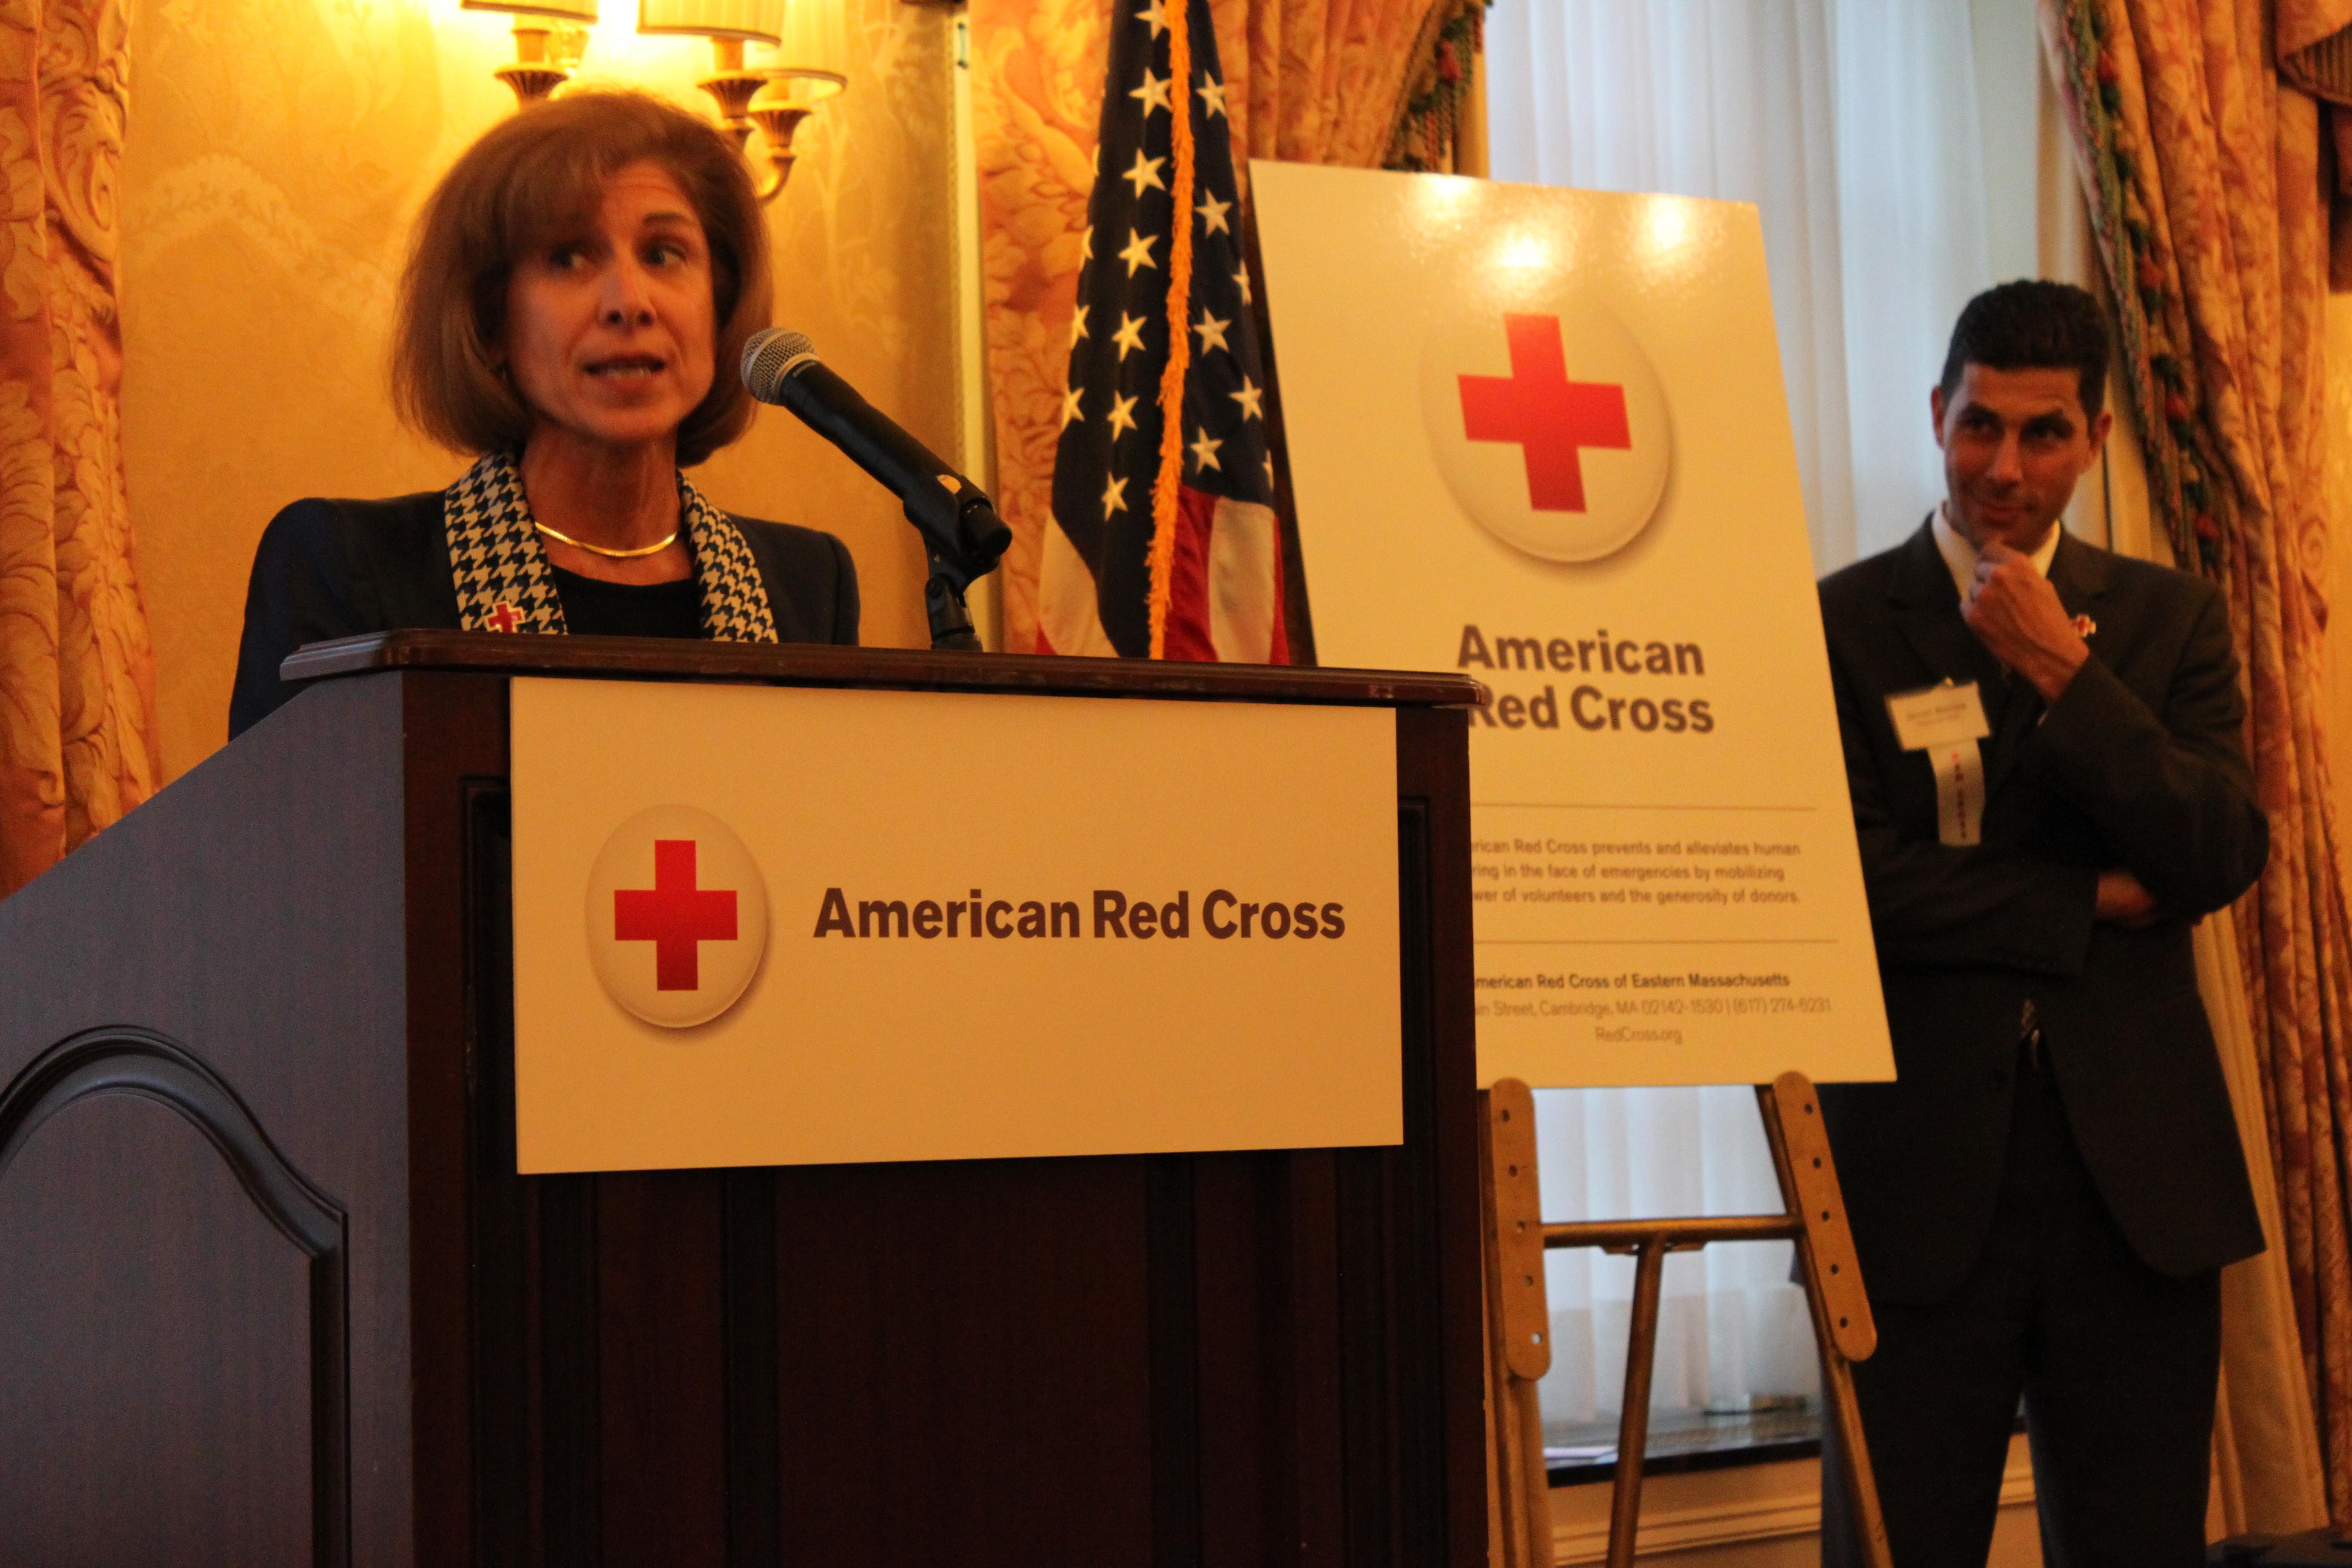 American Red Cross President Ceo Speaks In Boston